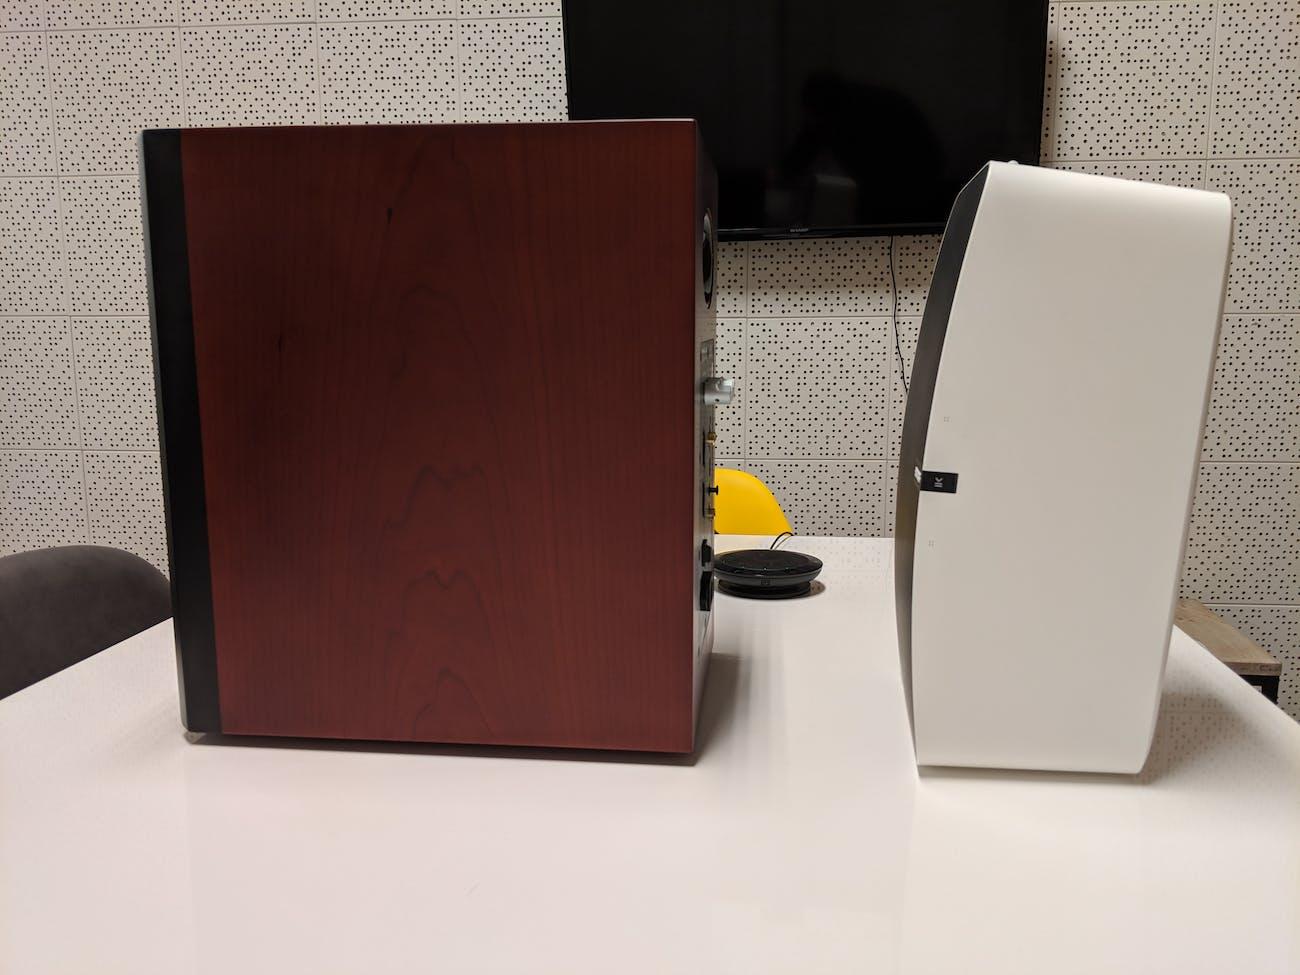 sonos airpulse speakers